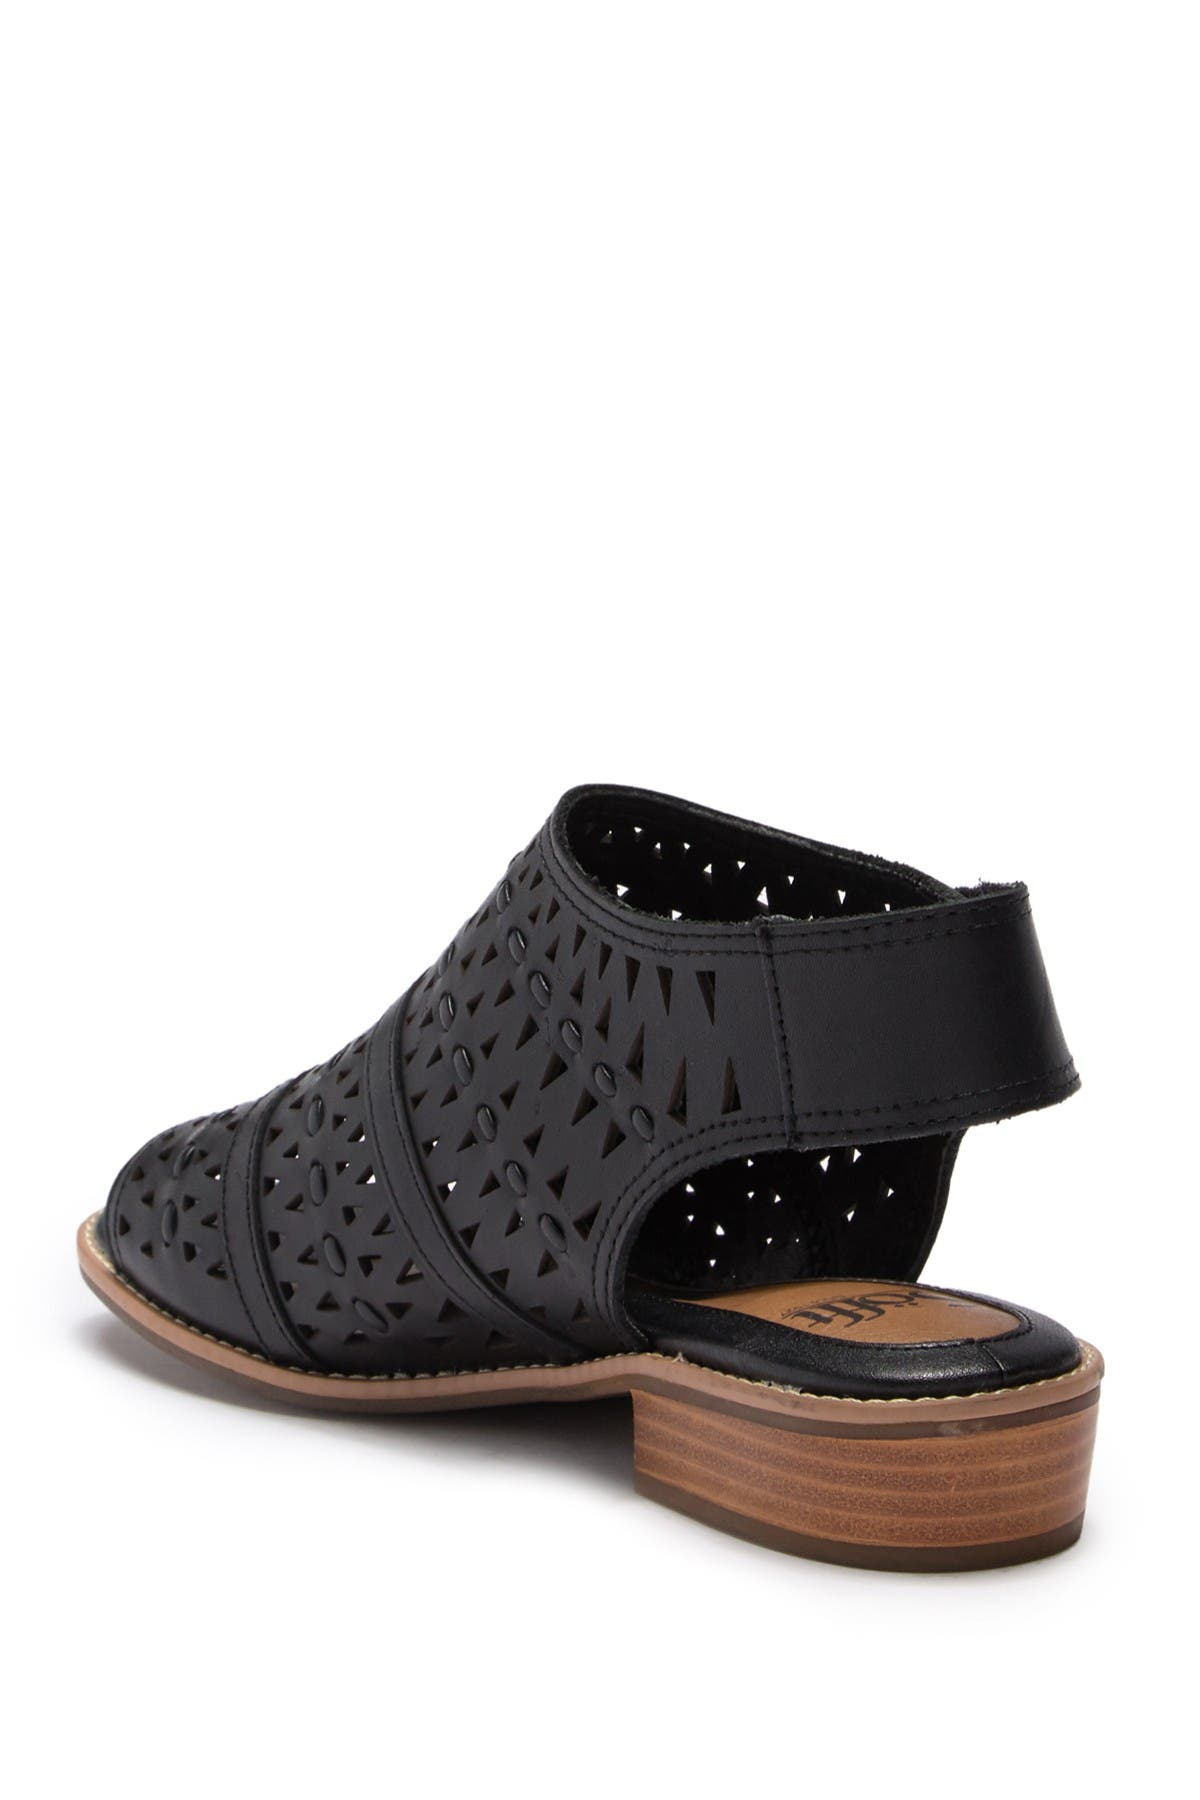 Sofft | Natalee Perforated Peep Toe